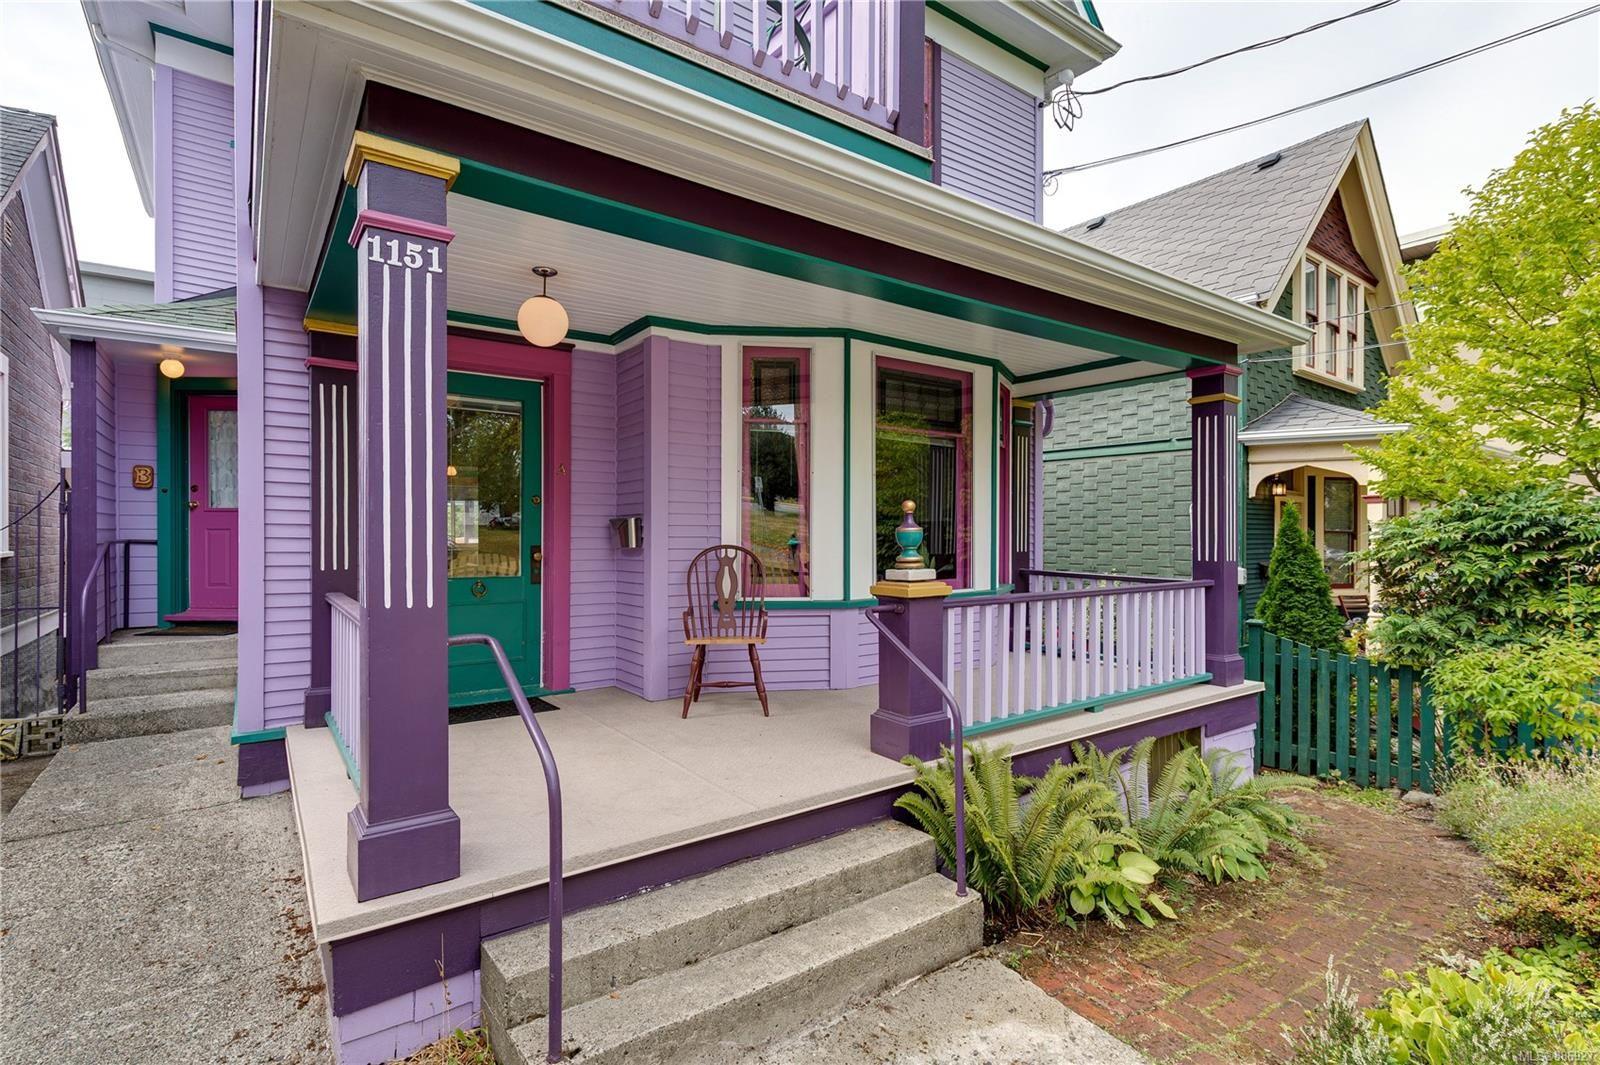 Main Photo: 1151 Pandora Ave in : Vi Fernwood House for sale (Victoria)  : MLS®# 886927